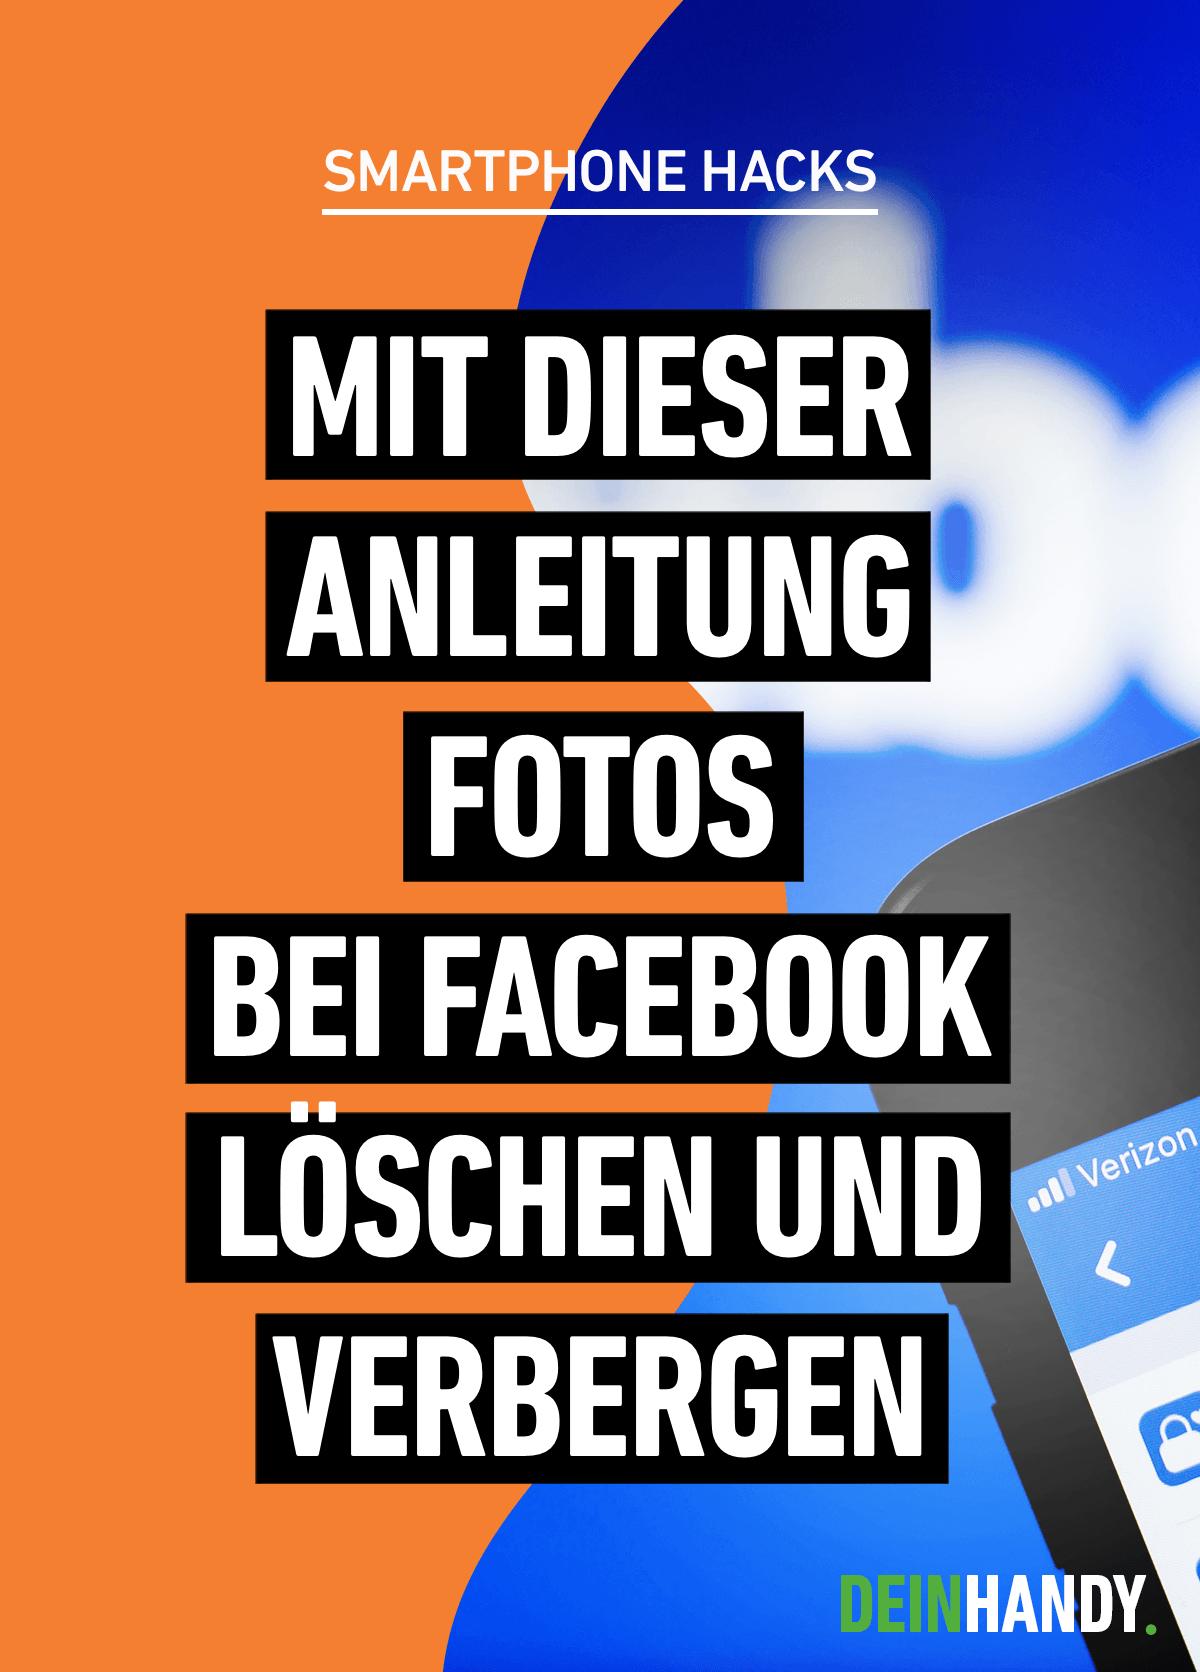 Löschen link facebook Facebook löschen: